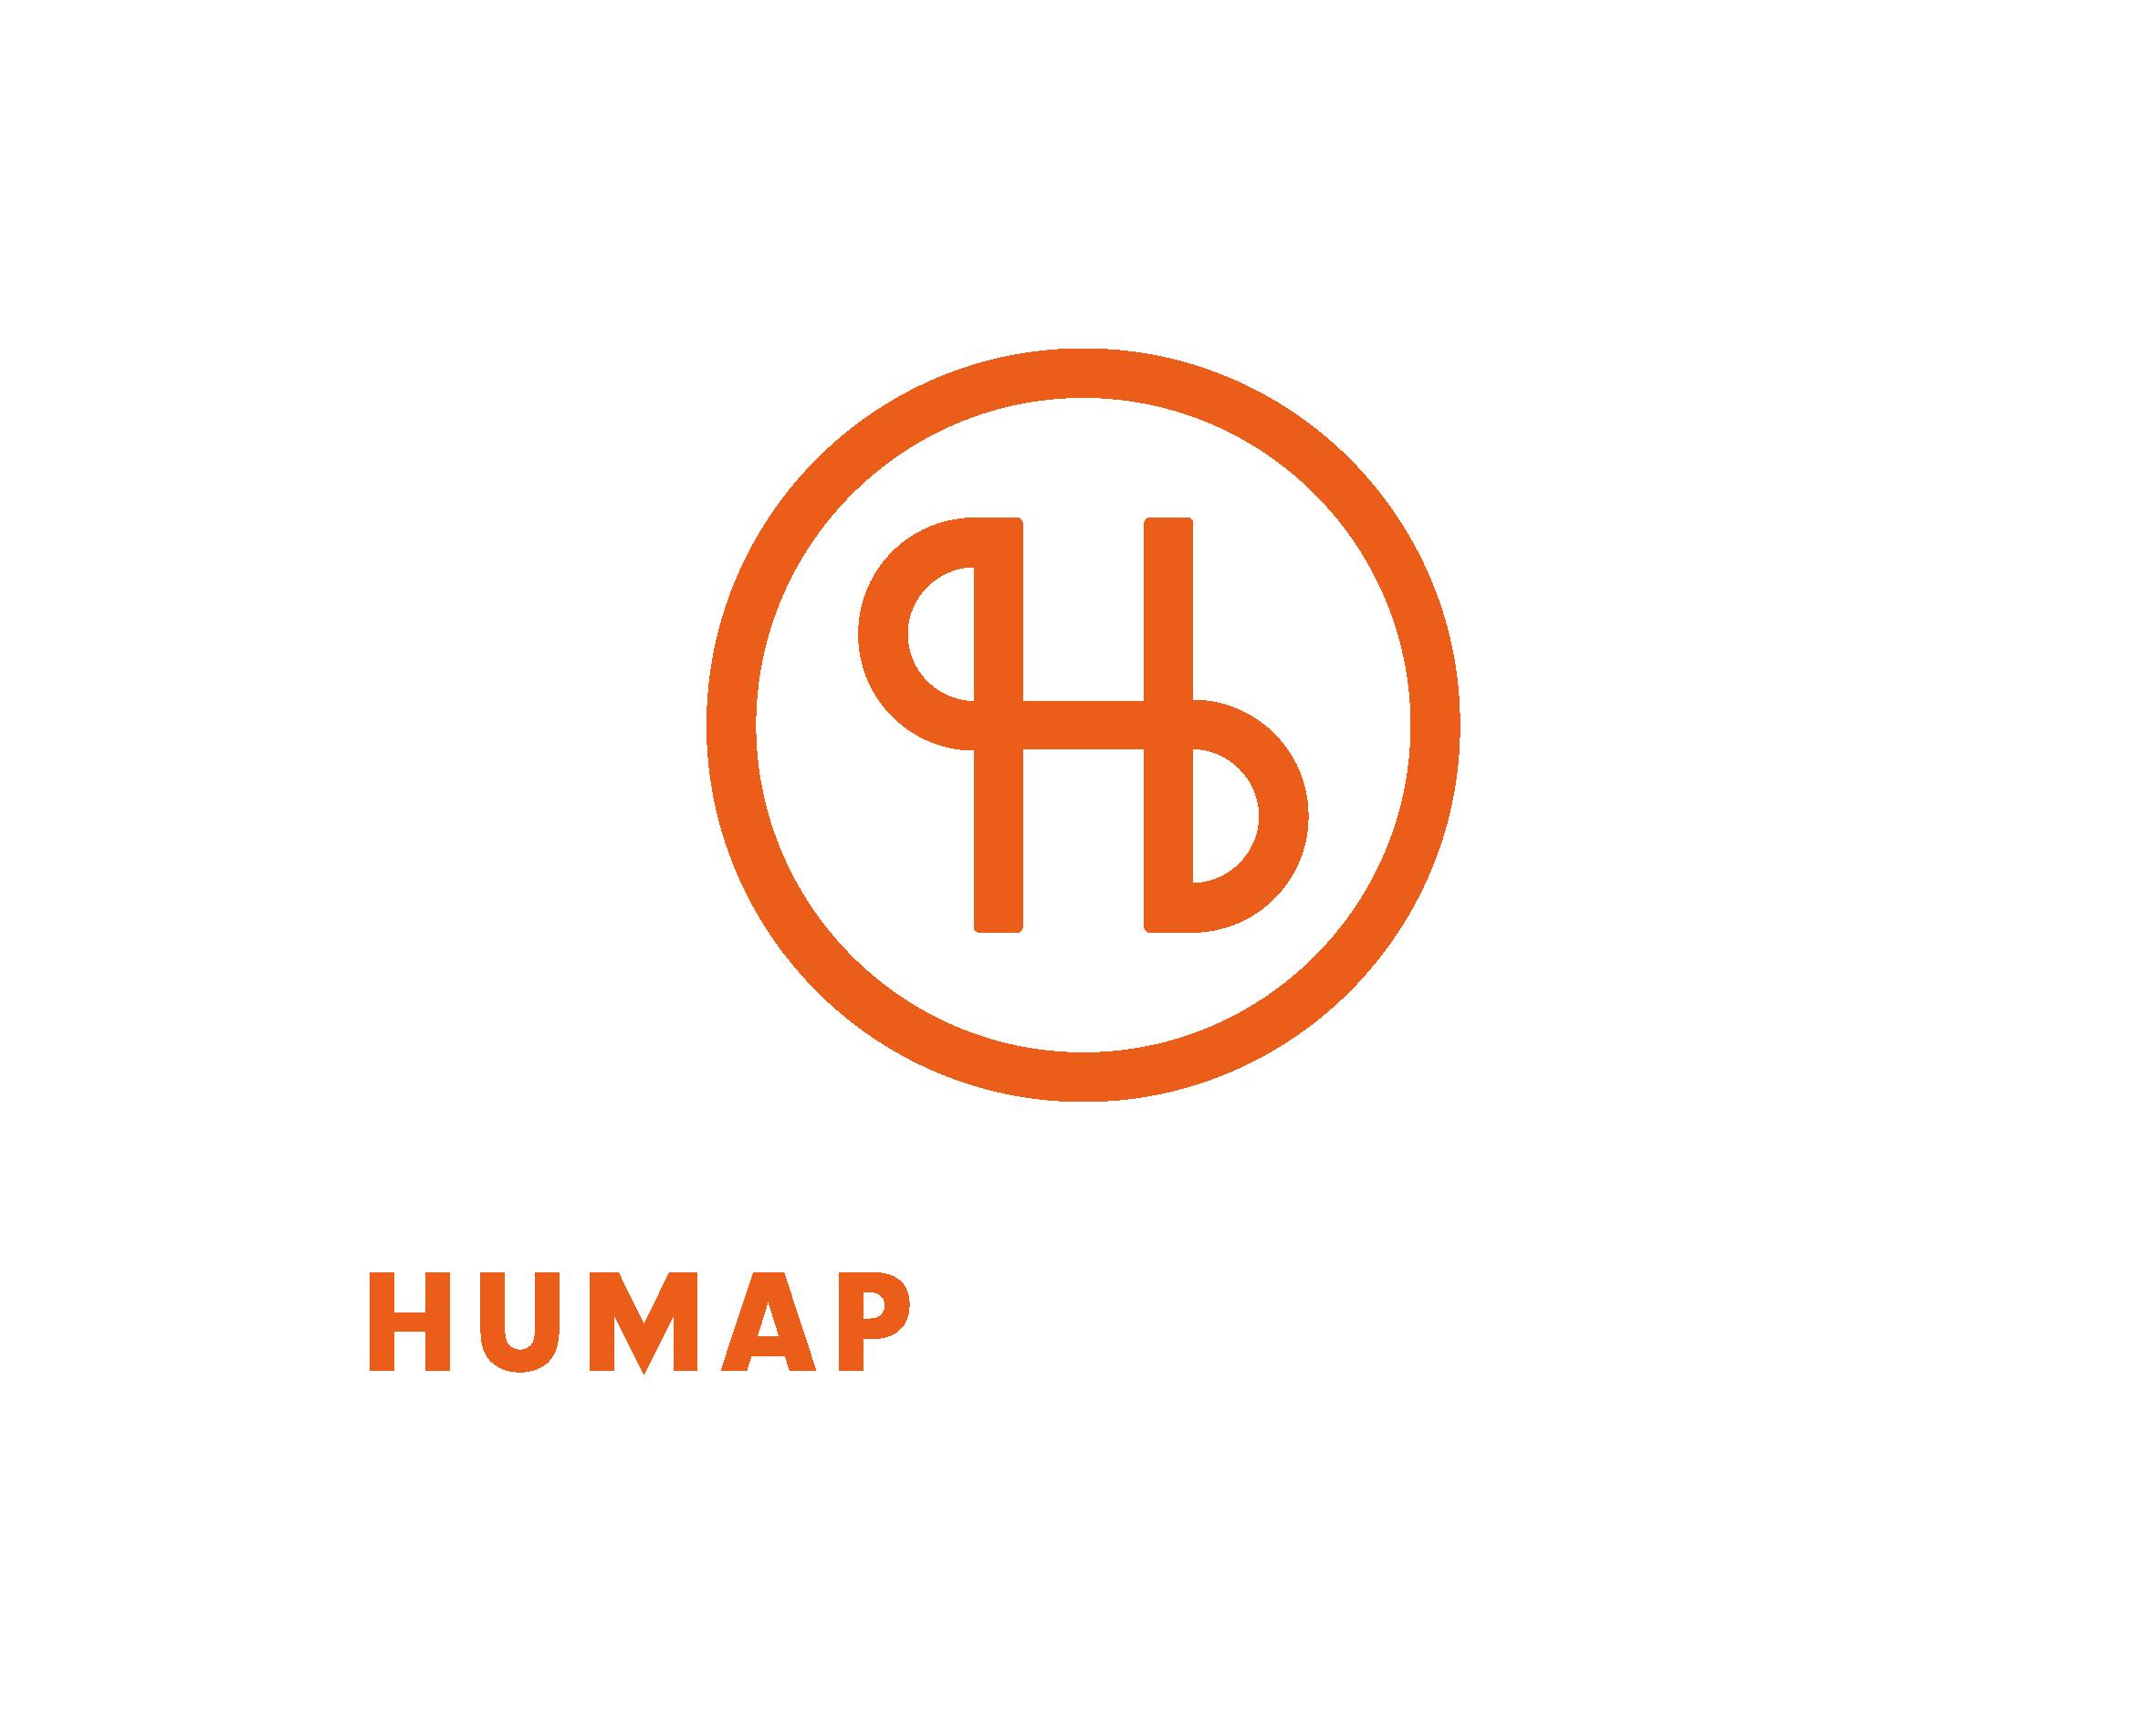 humap-software-logo-RGB-300ppi-white.png